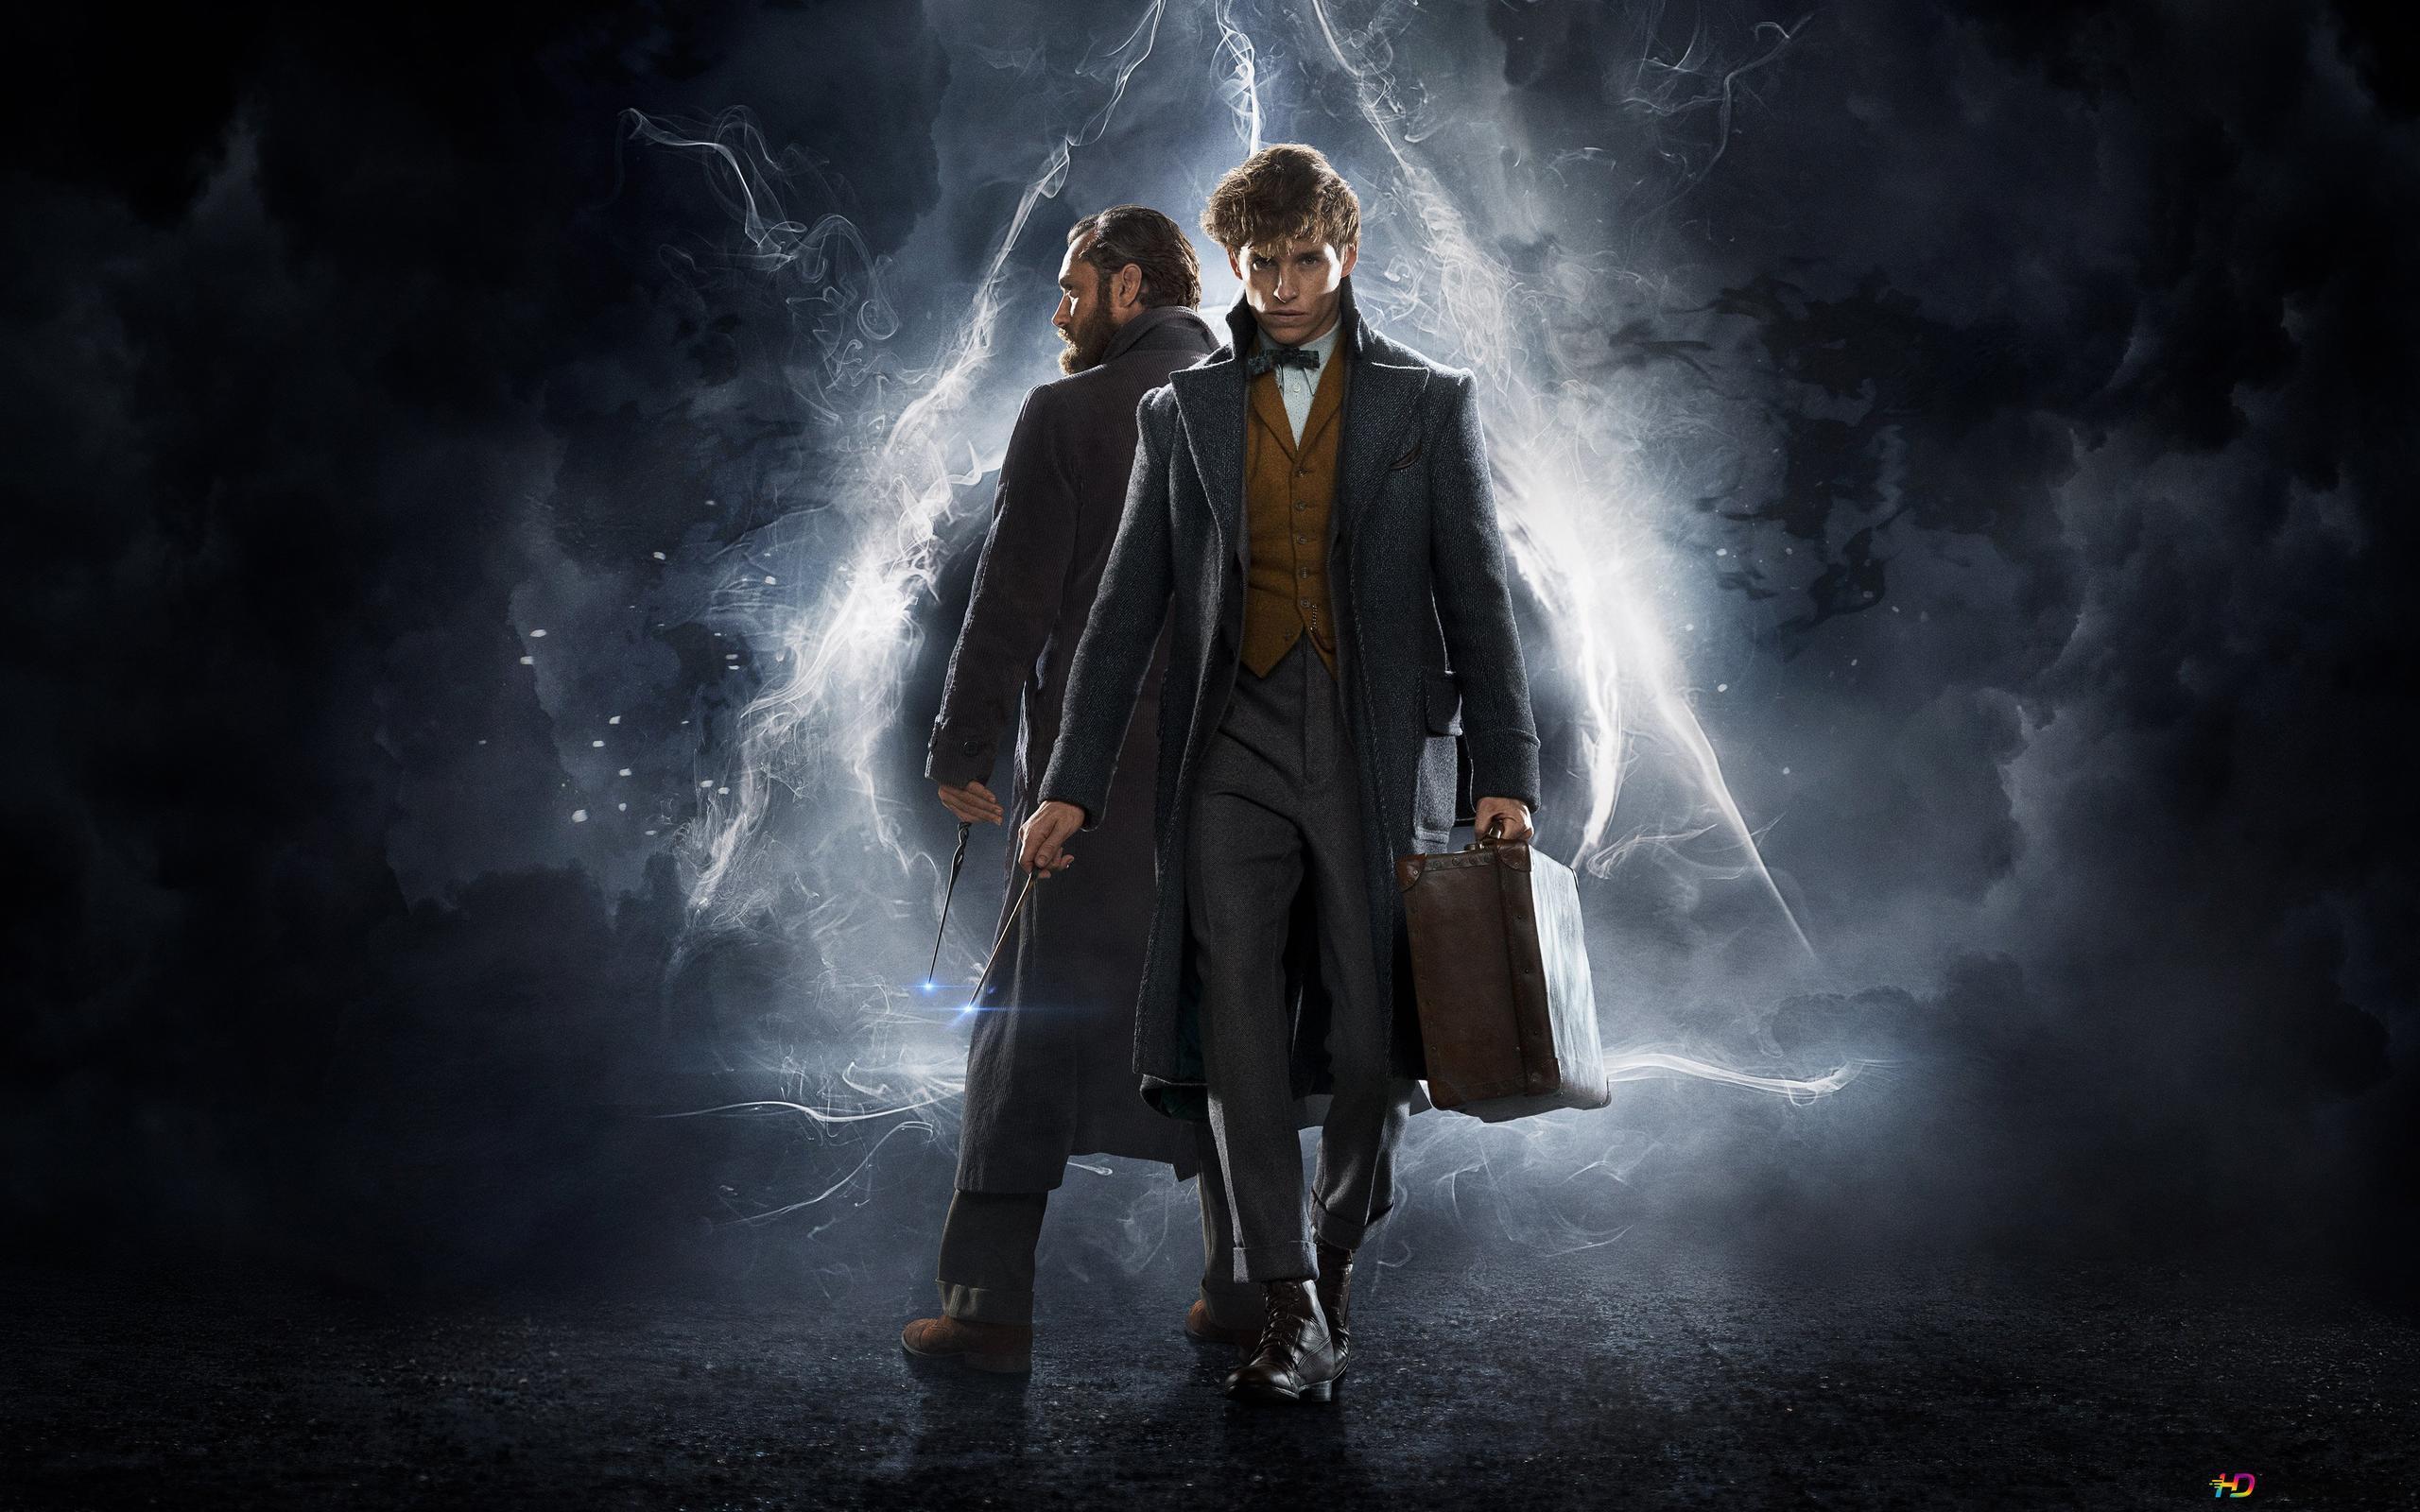 Albus Dumbledore Together With Newt Scamander Hd Wallpaper Download